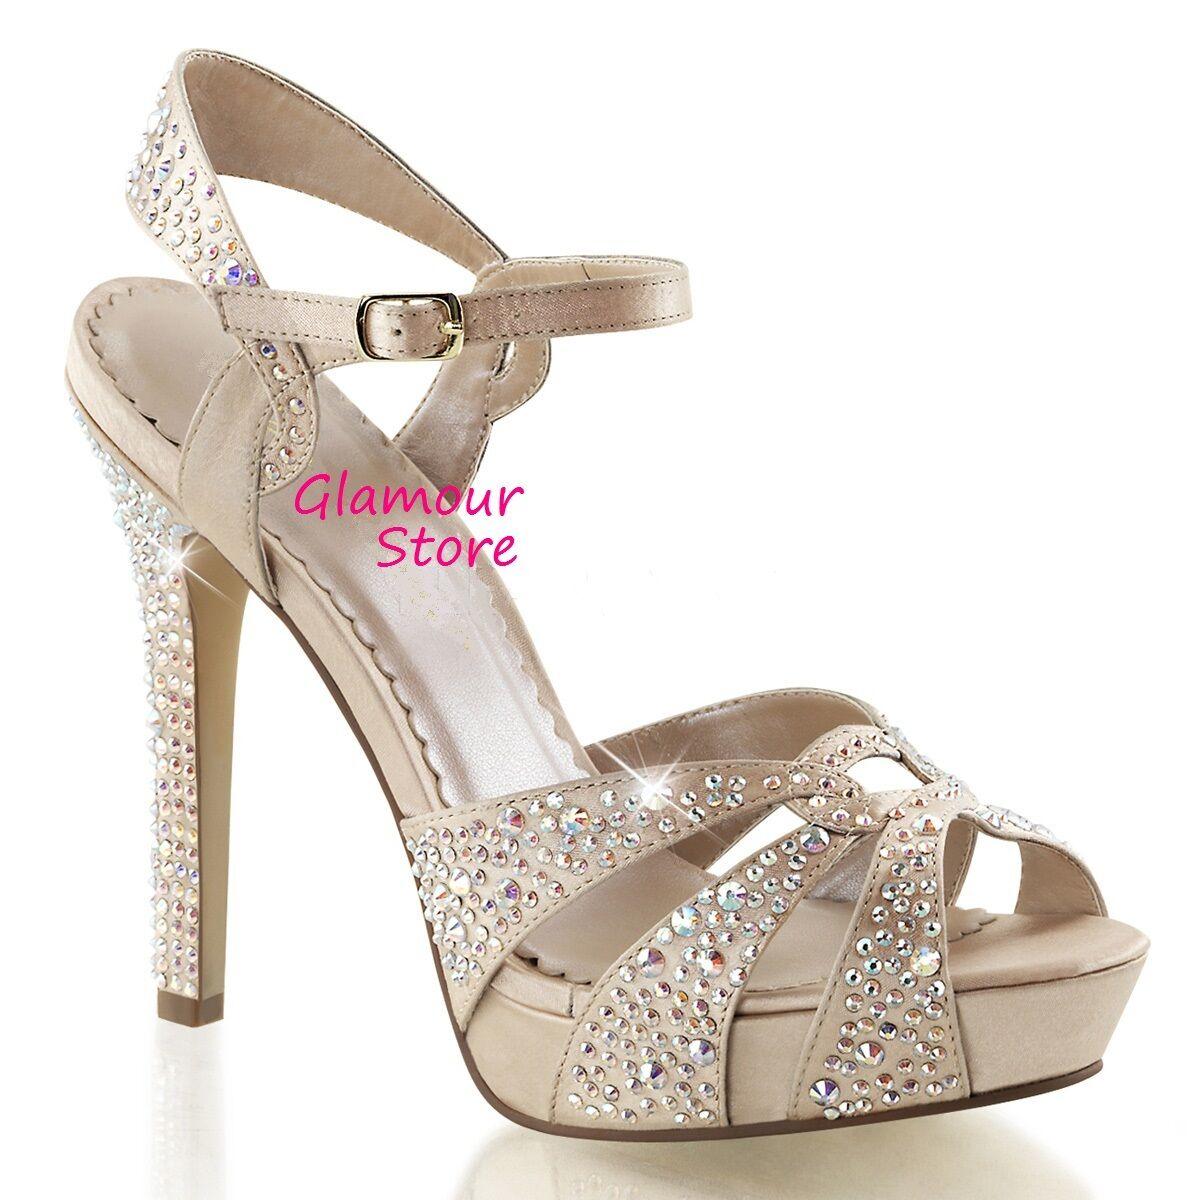 SEXY sandali STRASS plateau tacco 12 dal 35 al 41 CHAMPAGNE chaussures Sposa GLAMOUR